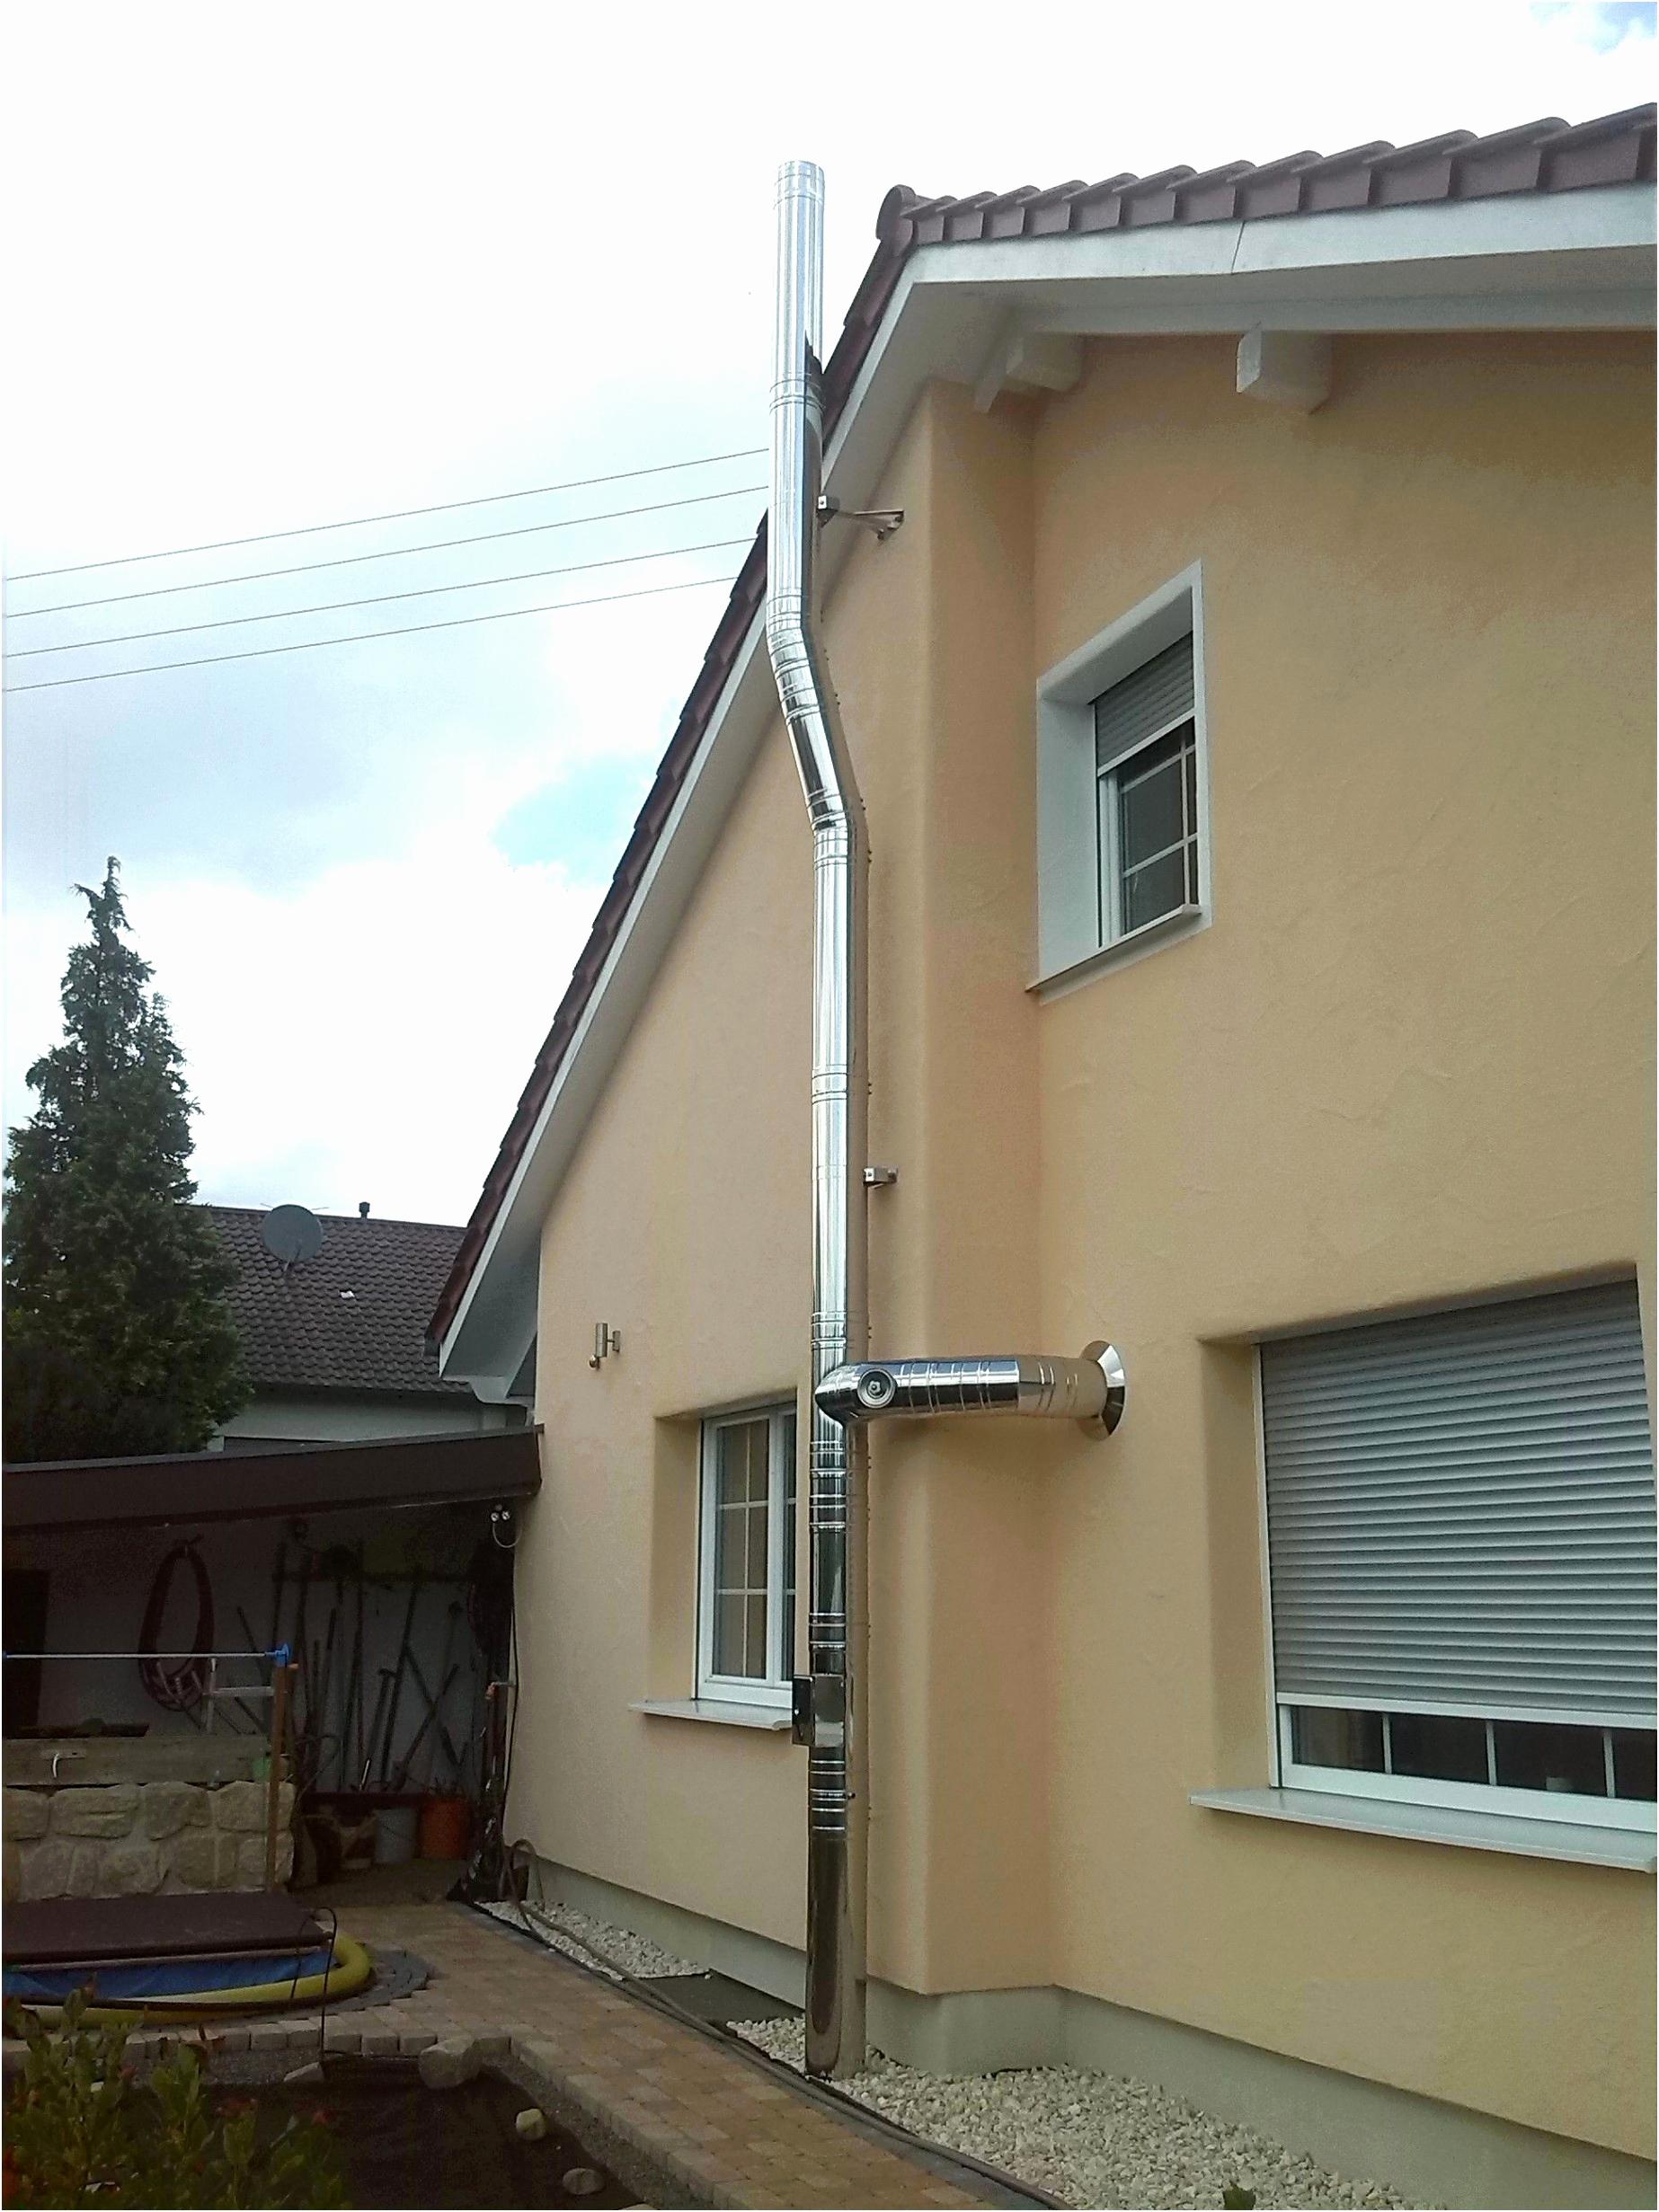 anbaubalkon mit treppe neu balkon selber bauen kosten genial hochbett selber bauen anleitung of anbaubalkon mit treppe